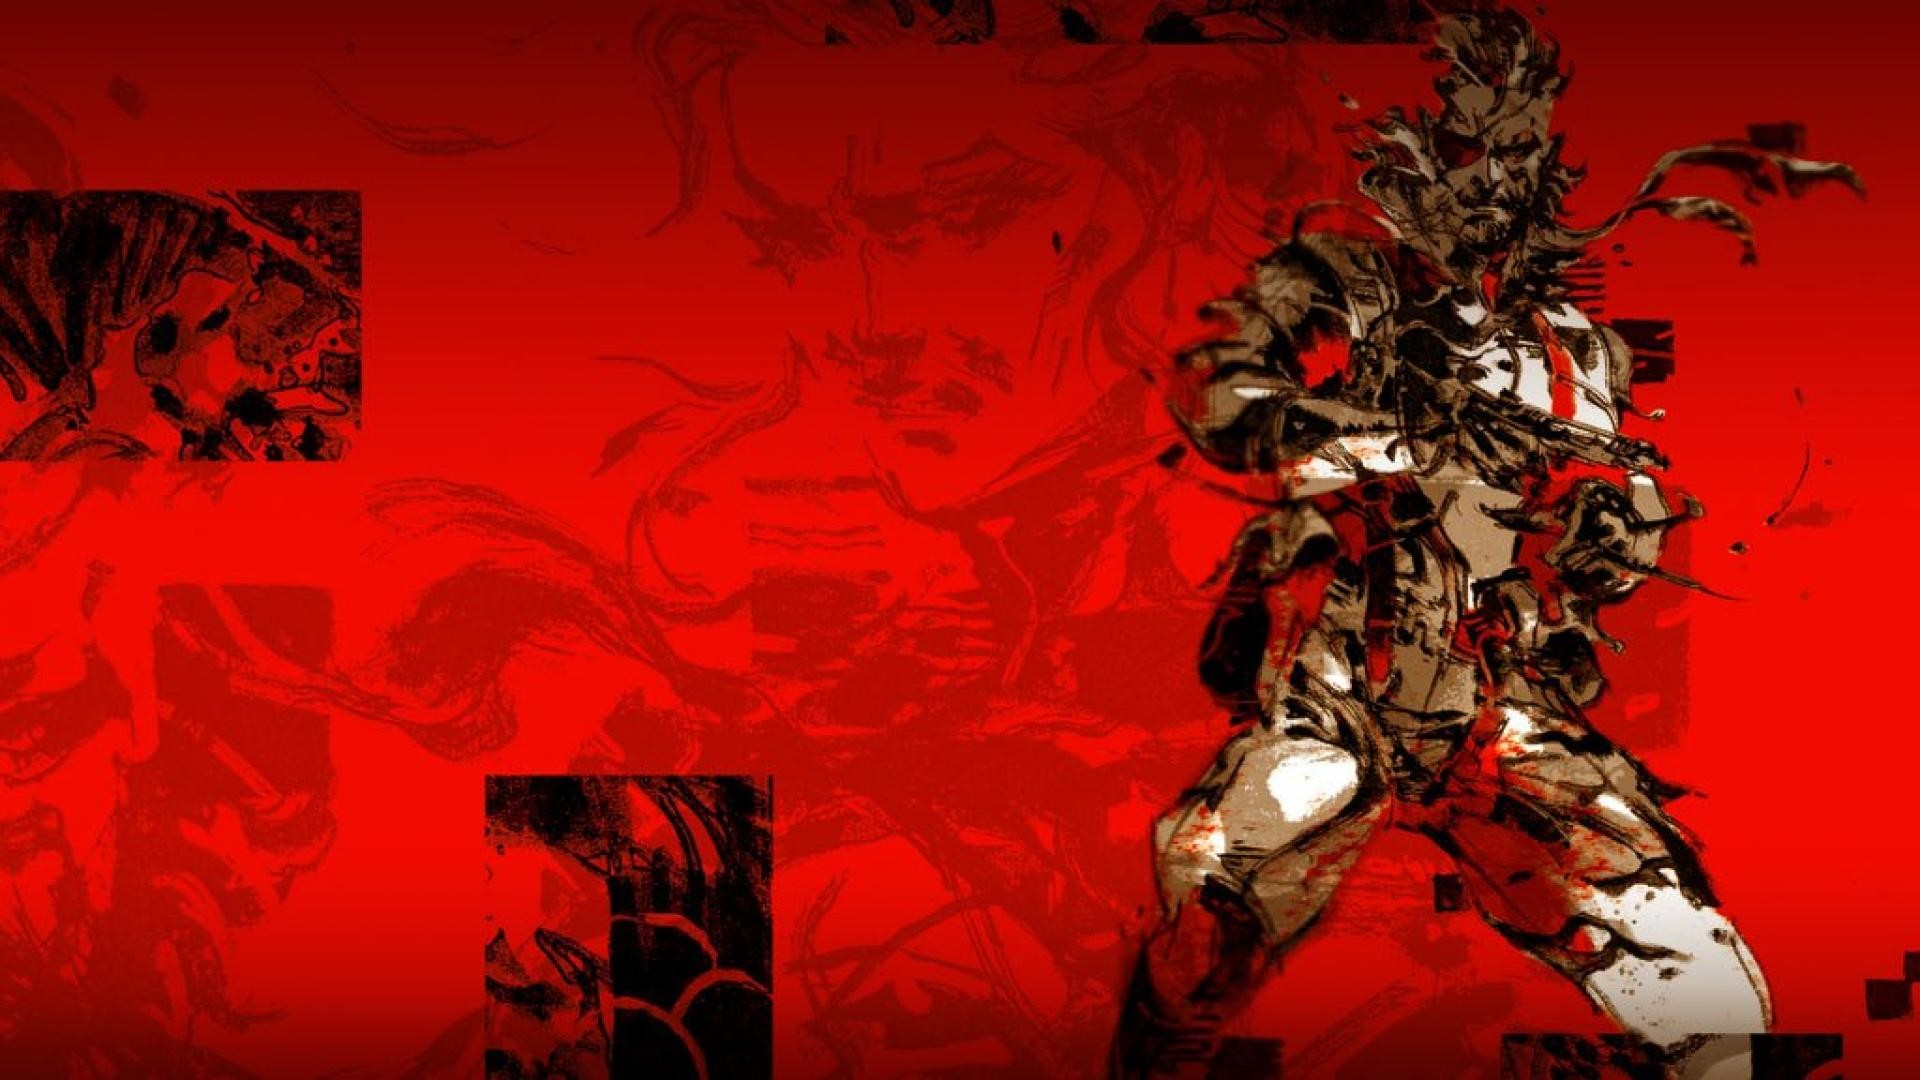 metal gear solid snake eater art hd wallpaper – (#2712) – HQ .